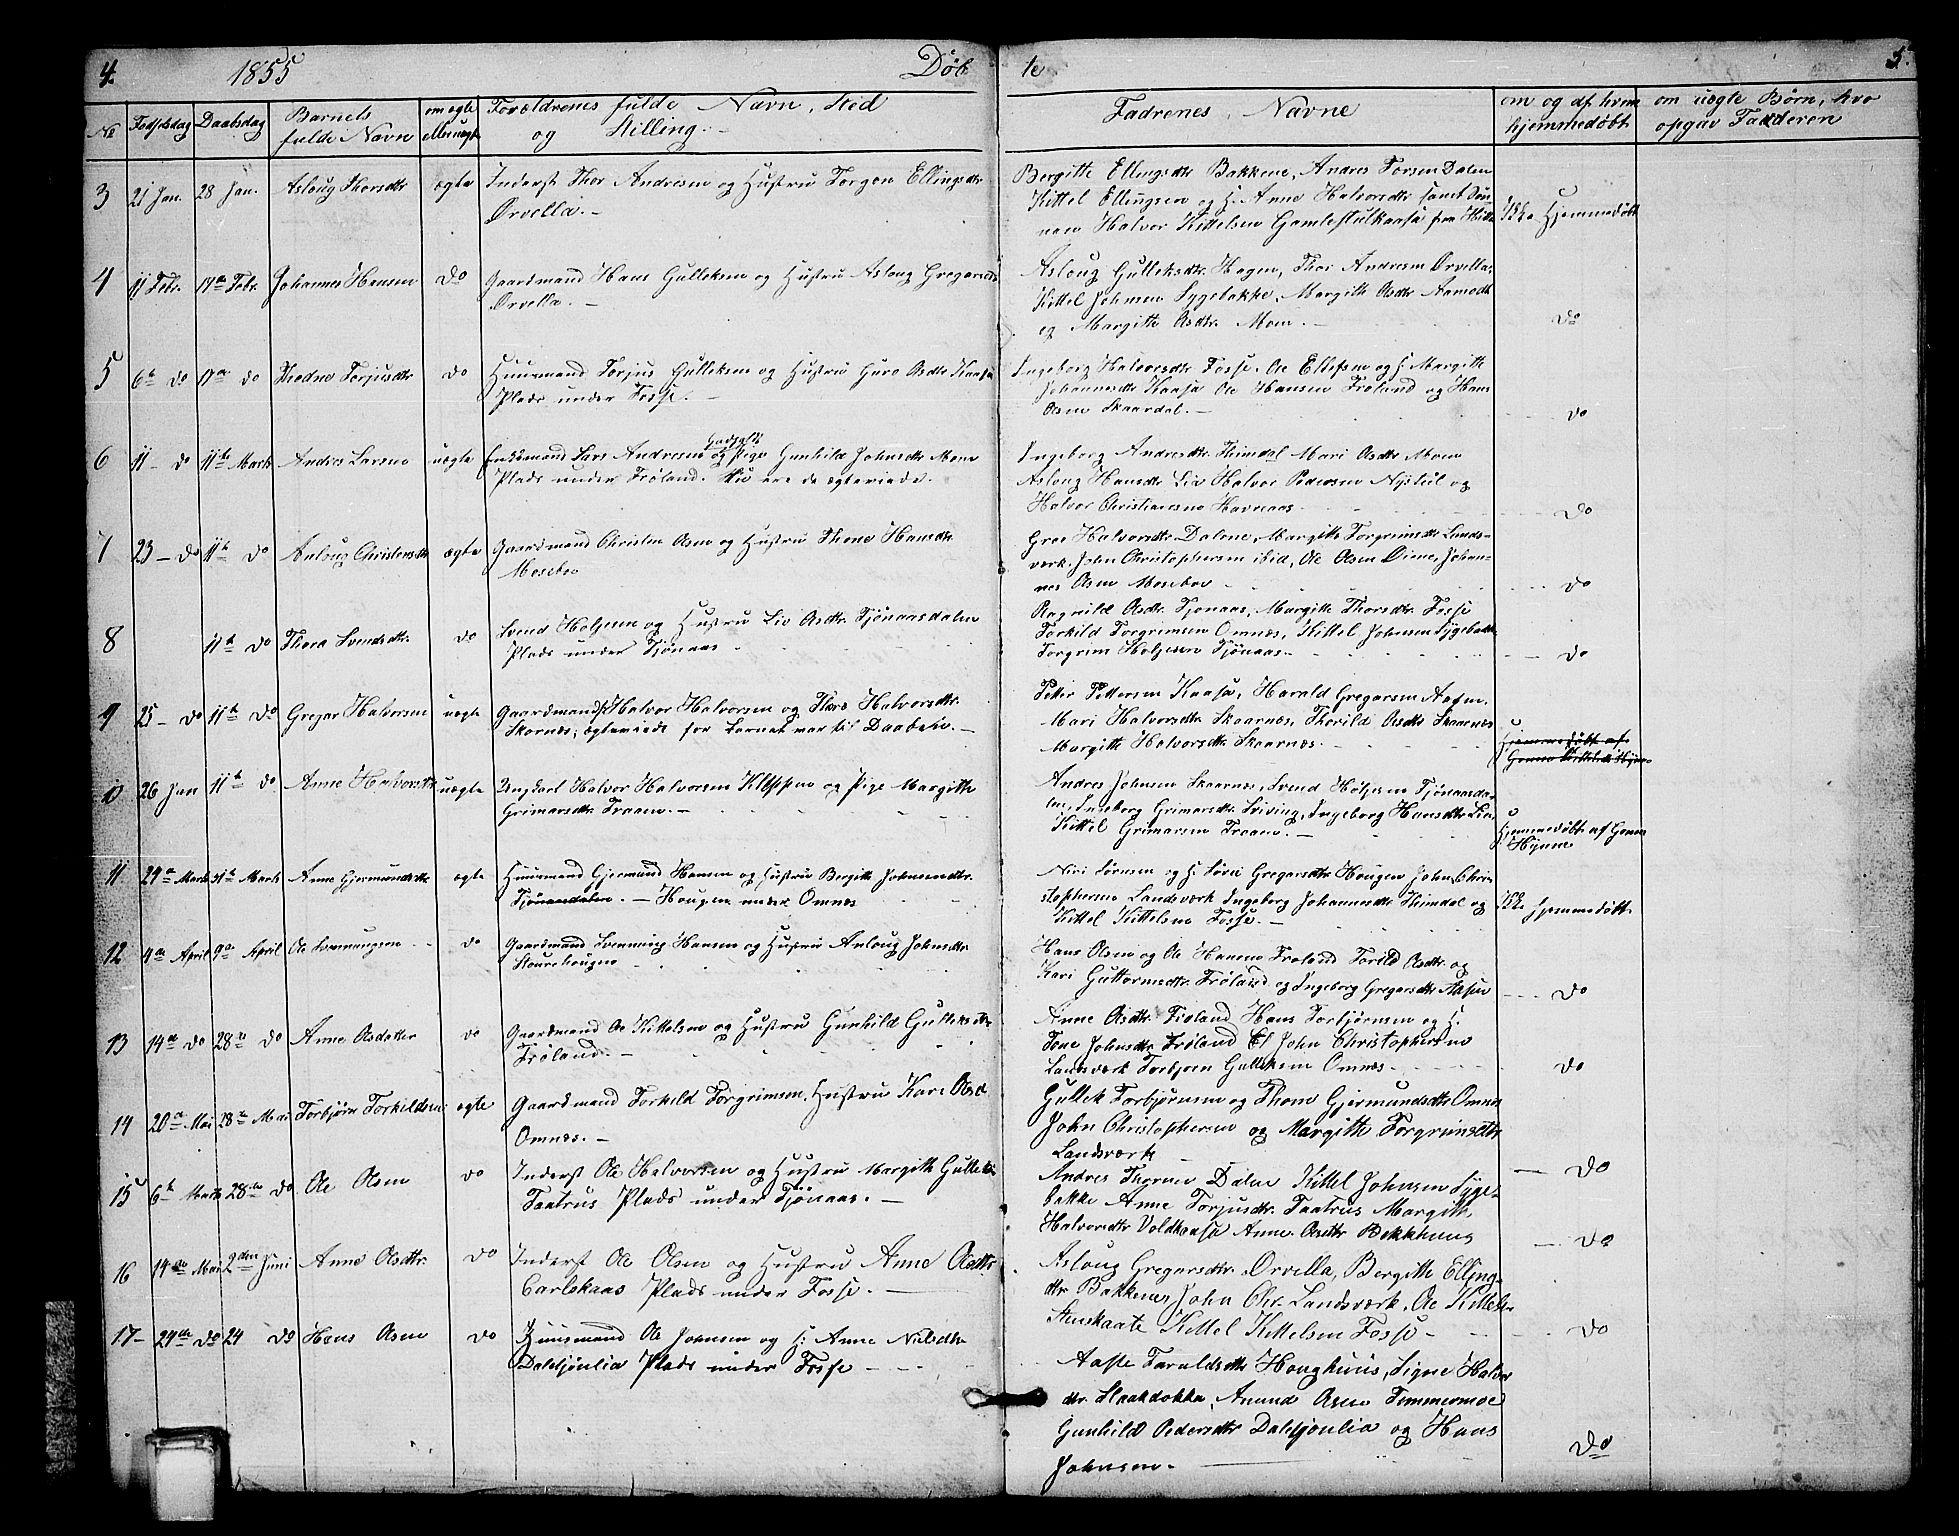 SAKO, Hjartdal kirkebøker, G/Gb/L0002: Klokkerbok nr. II 2, 1854-1884, s. 4-5